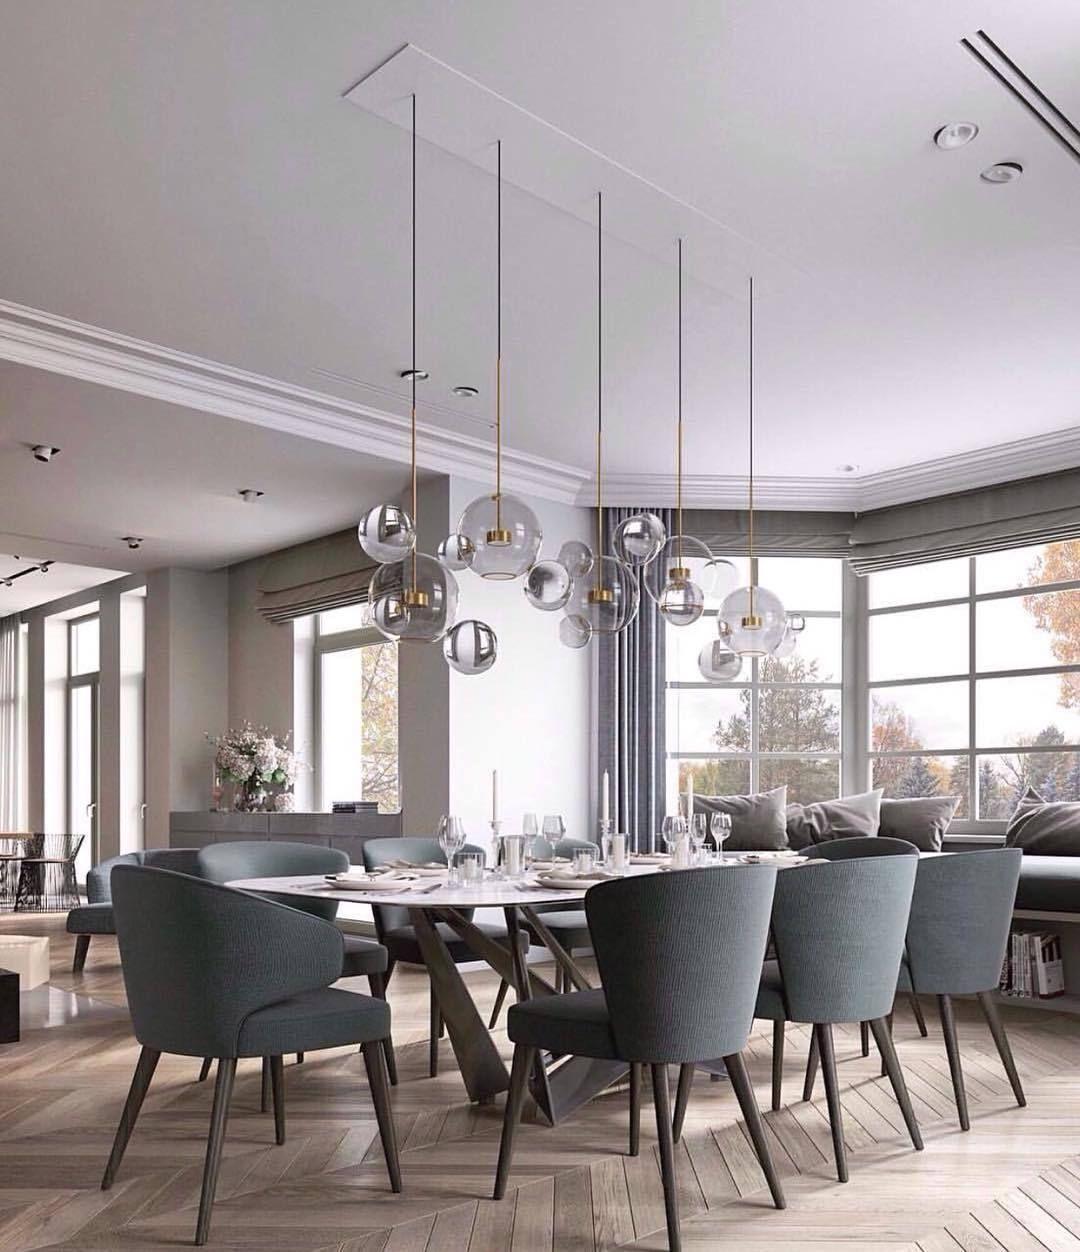 Bolle Pendant Light Mooielight Modern Dining Room Dining Room Decor Dining Room Design